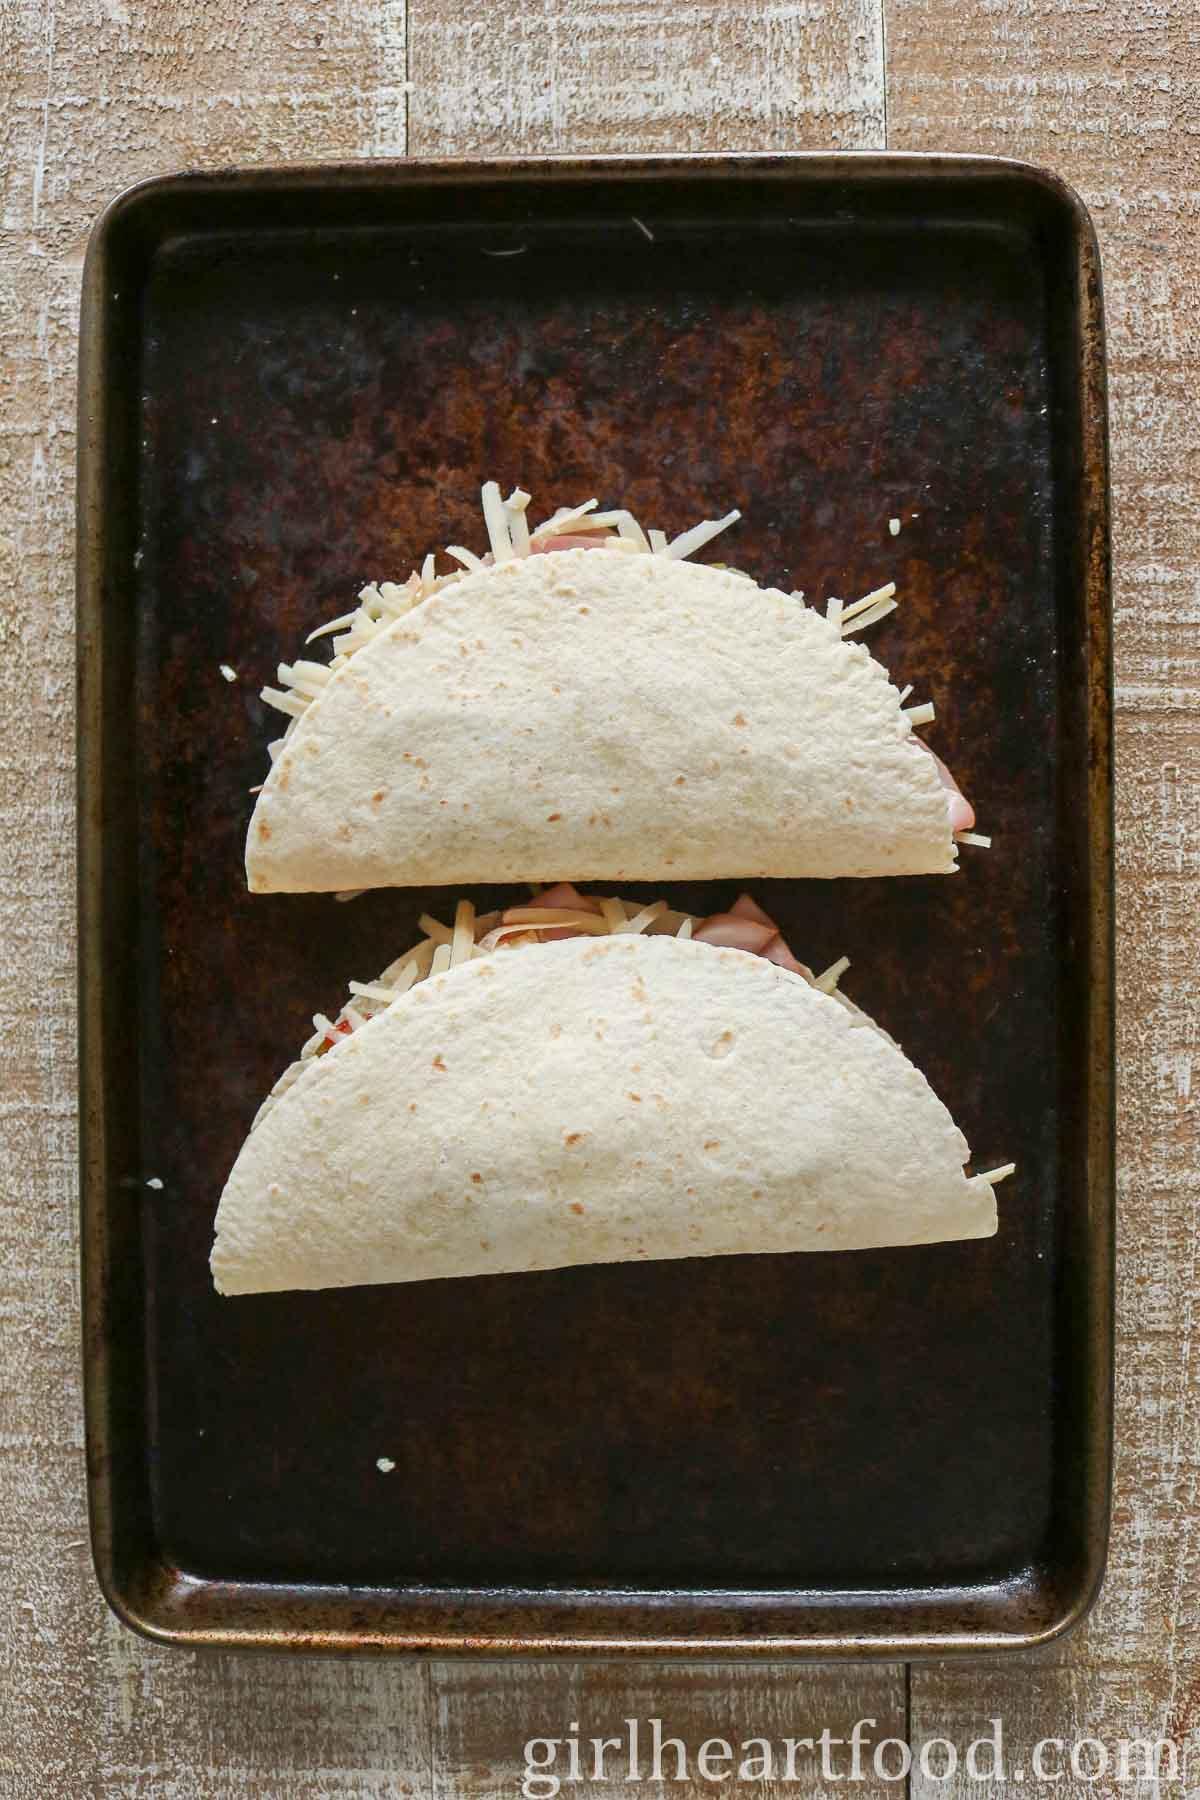 Two quesadillas on a sheet pan before pan frying.